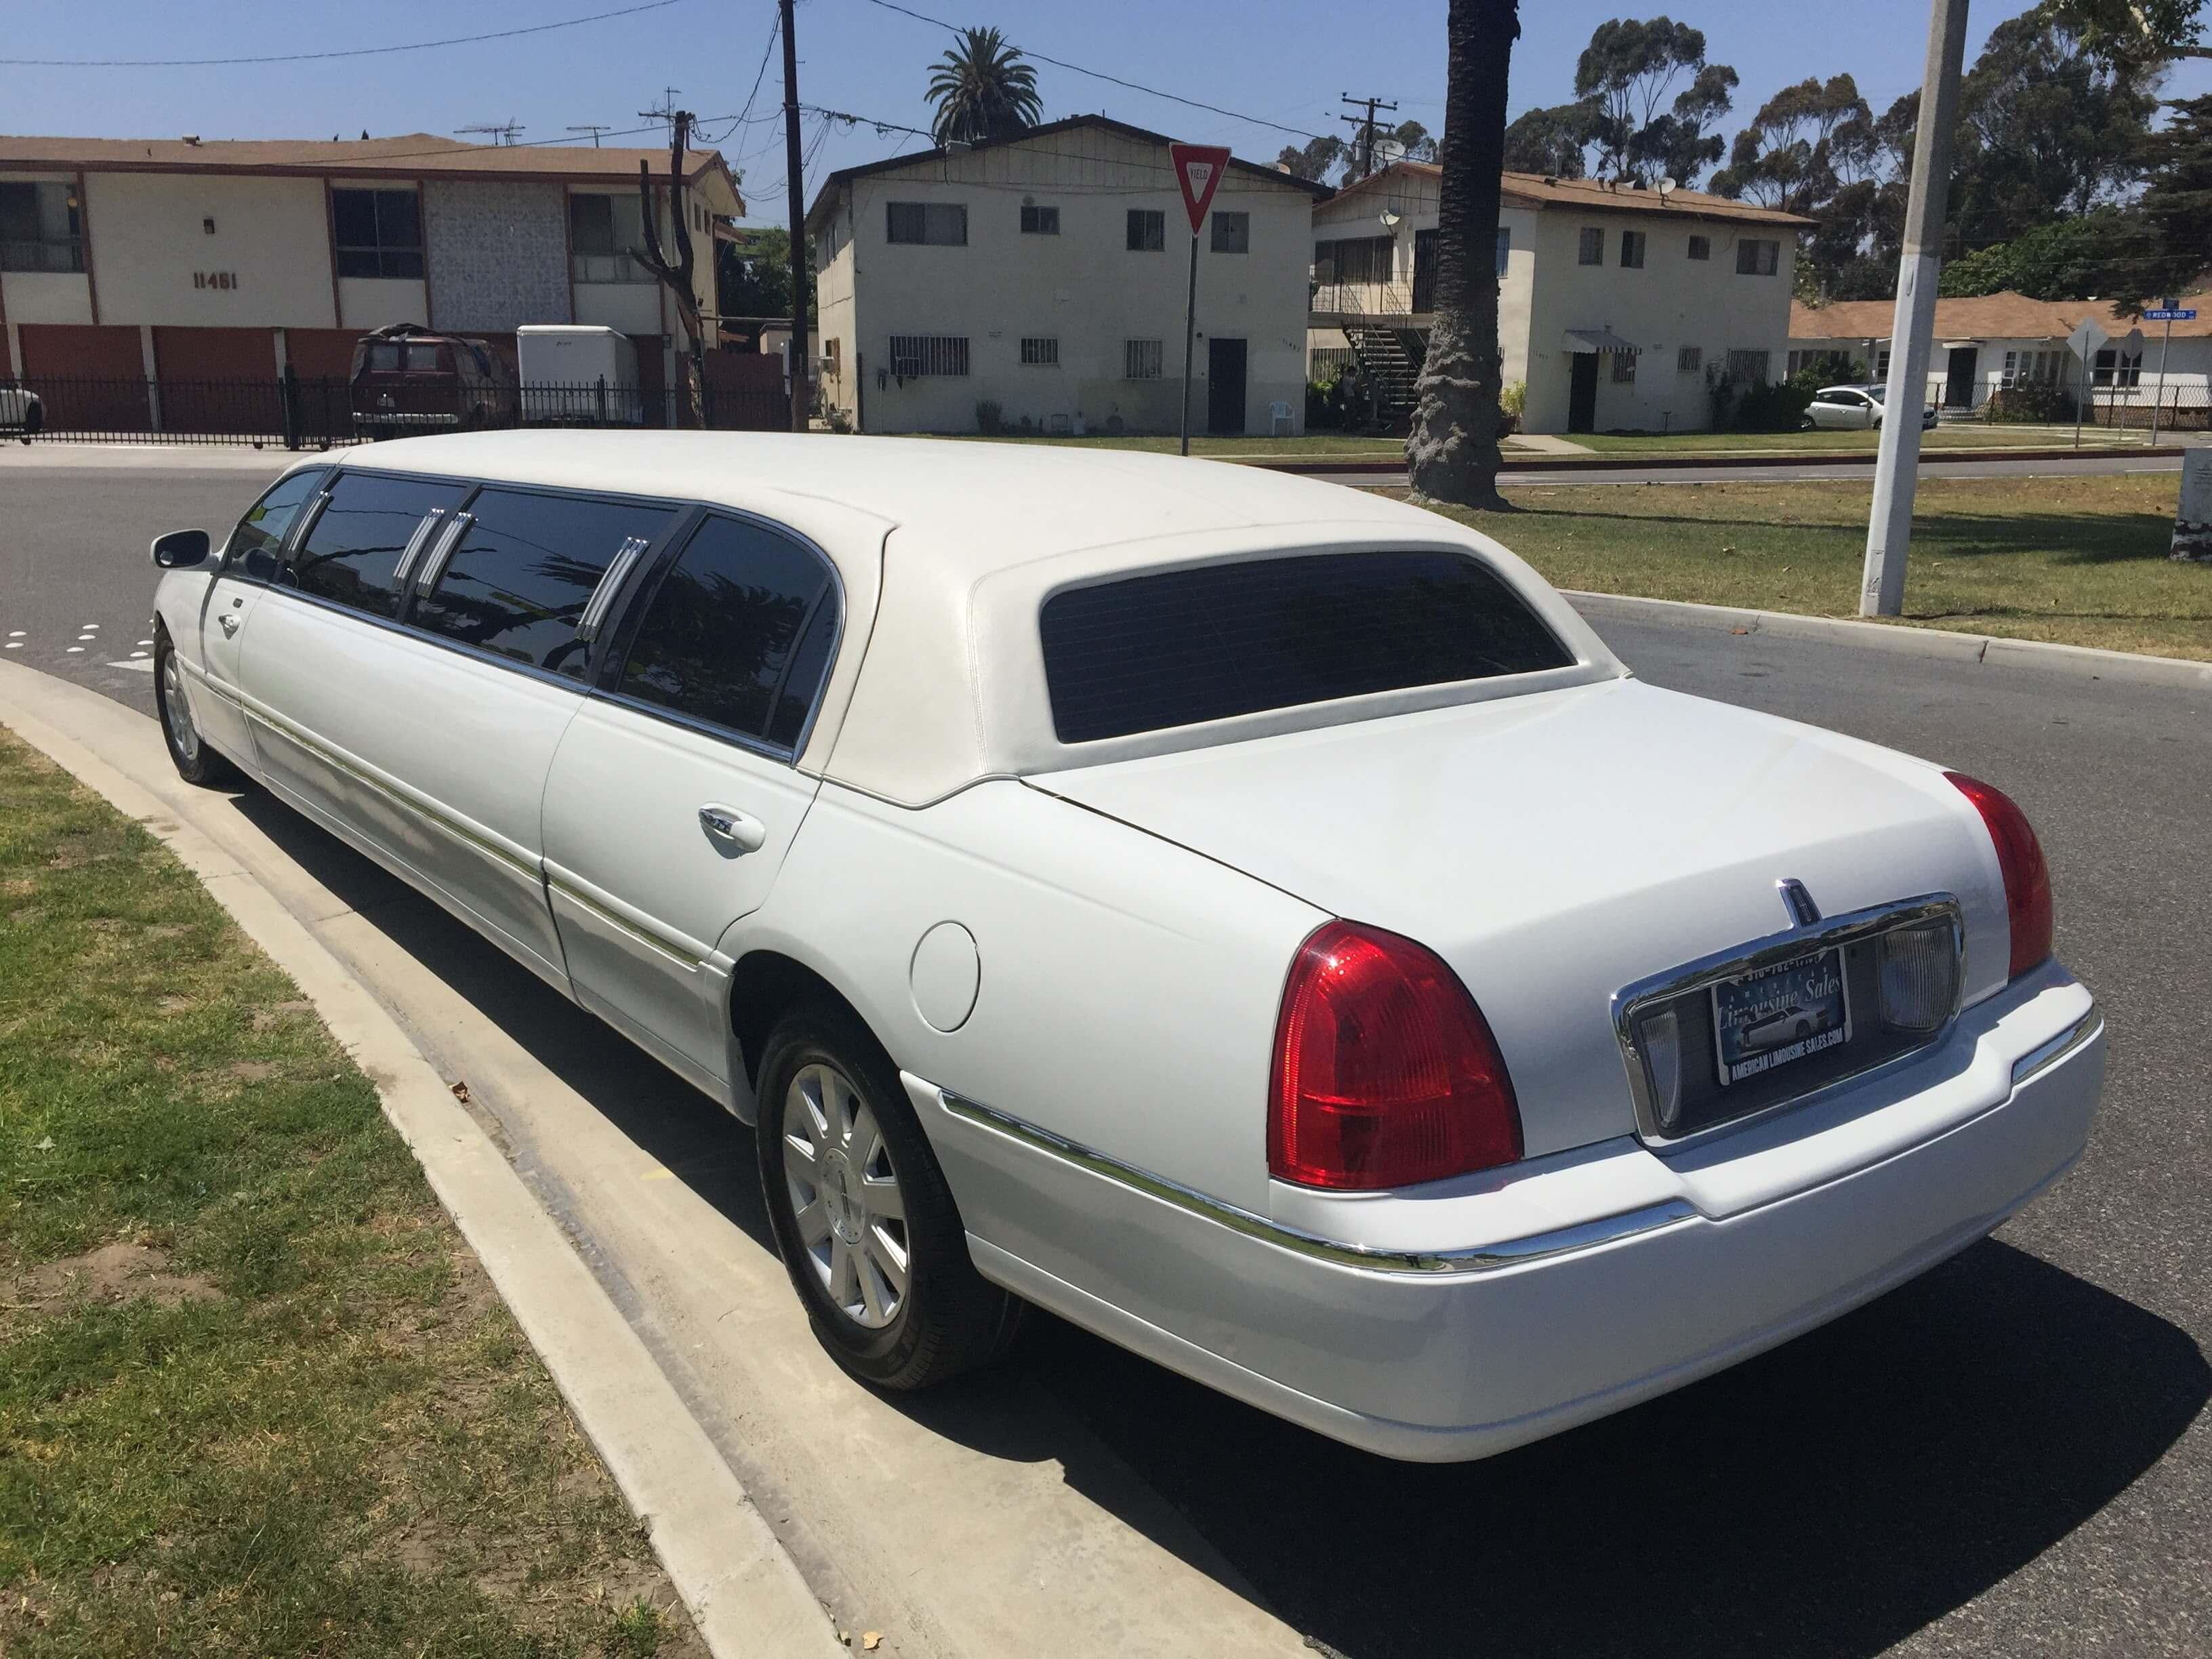 2004 white 120 inch lincoln towncar limousine for sale left rear